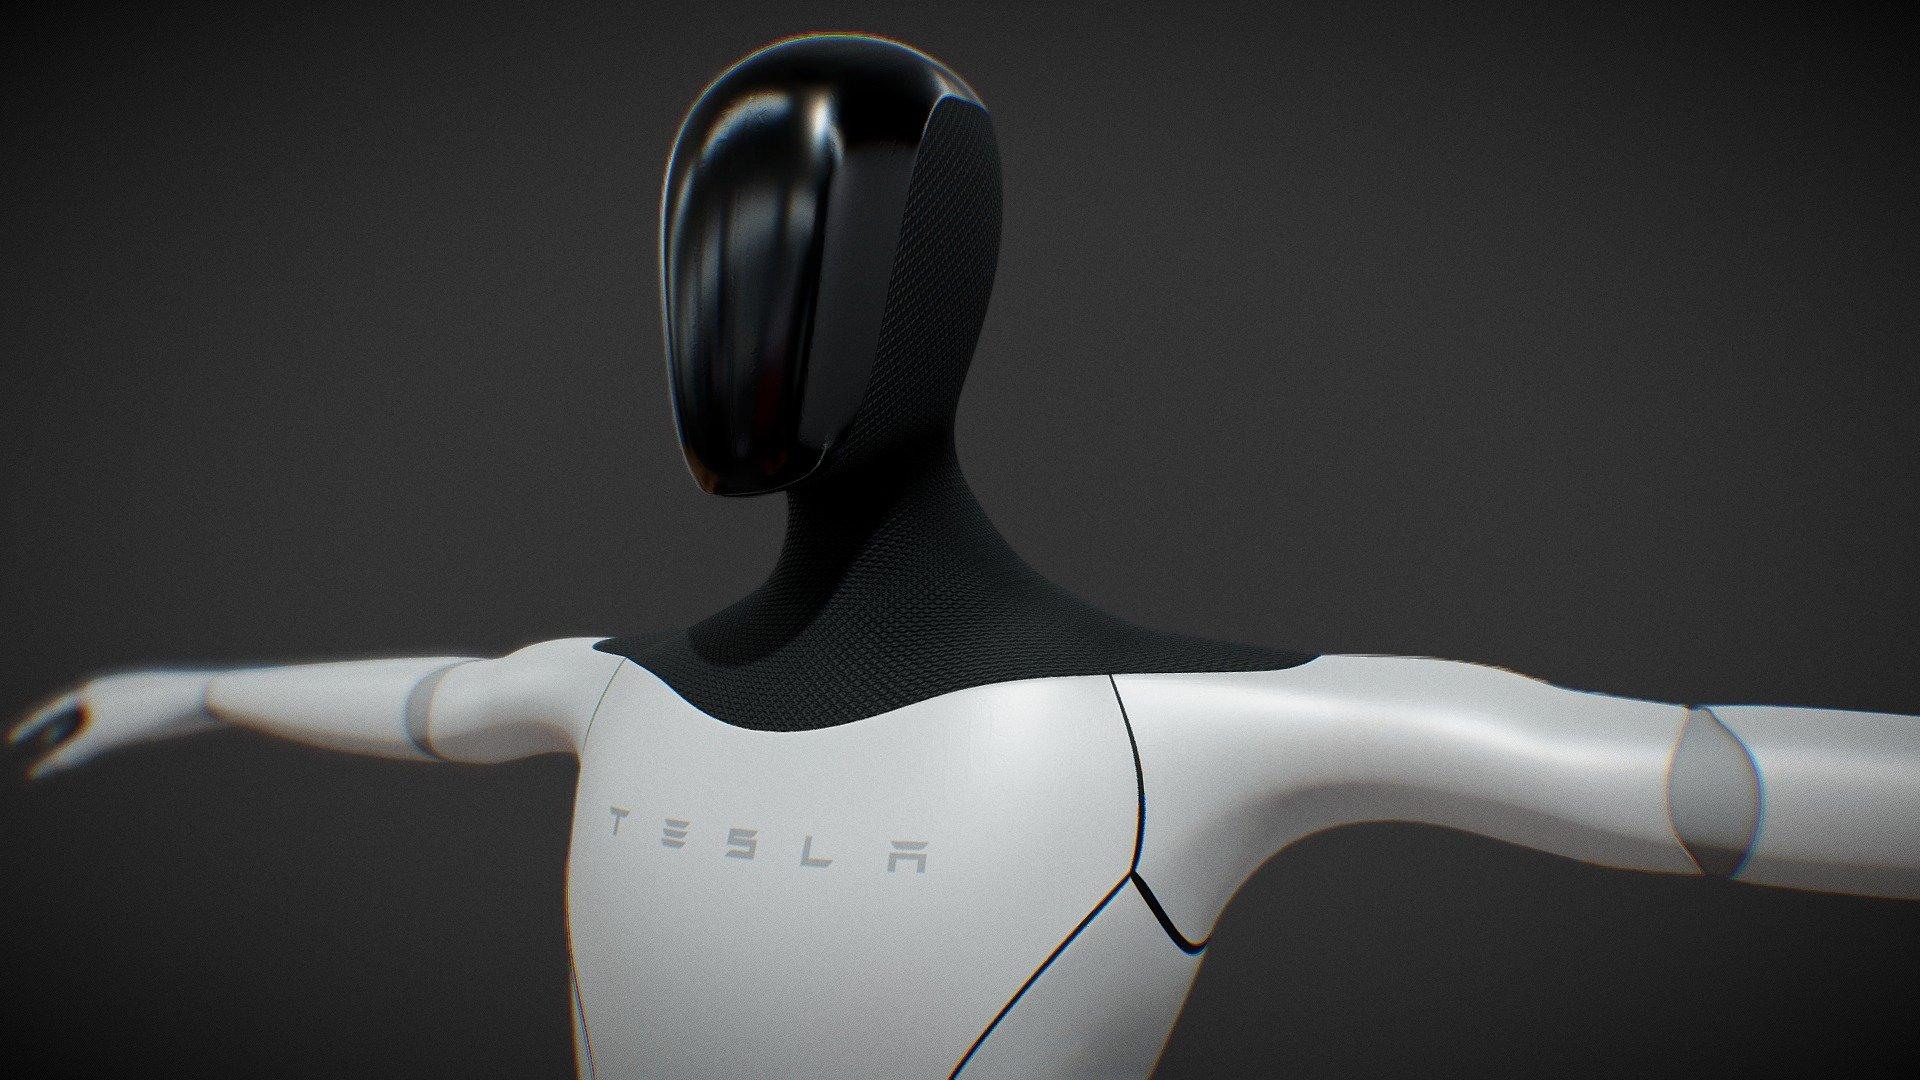 Elon Musk unveils Tesla Bot, a humanoid robot that uses vehicle AI – International IT recruitment